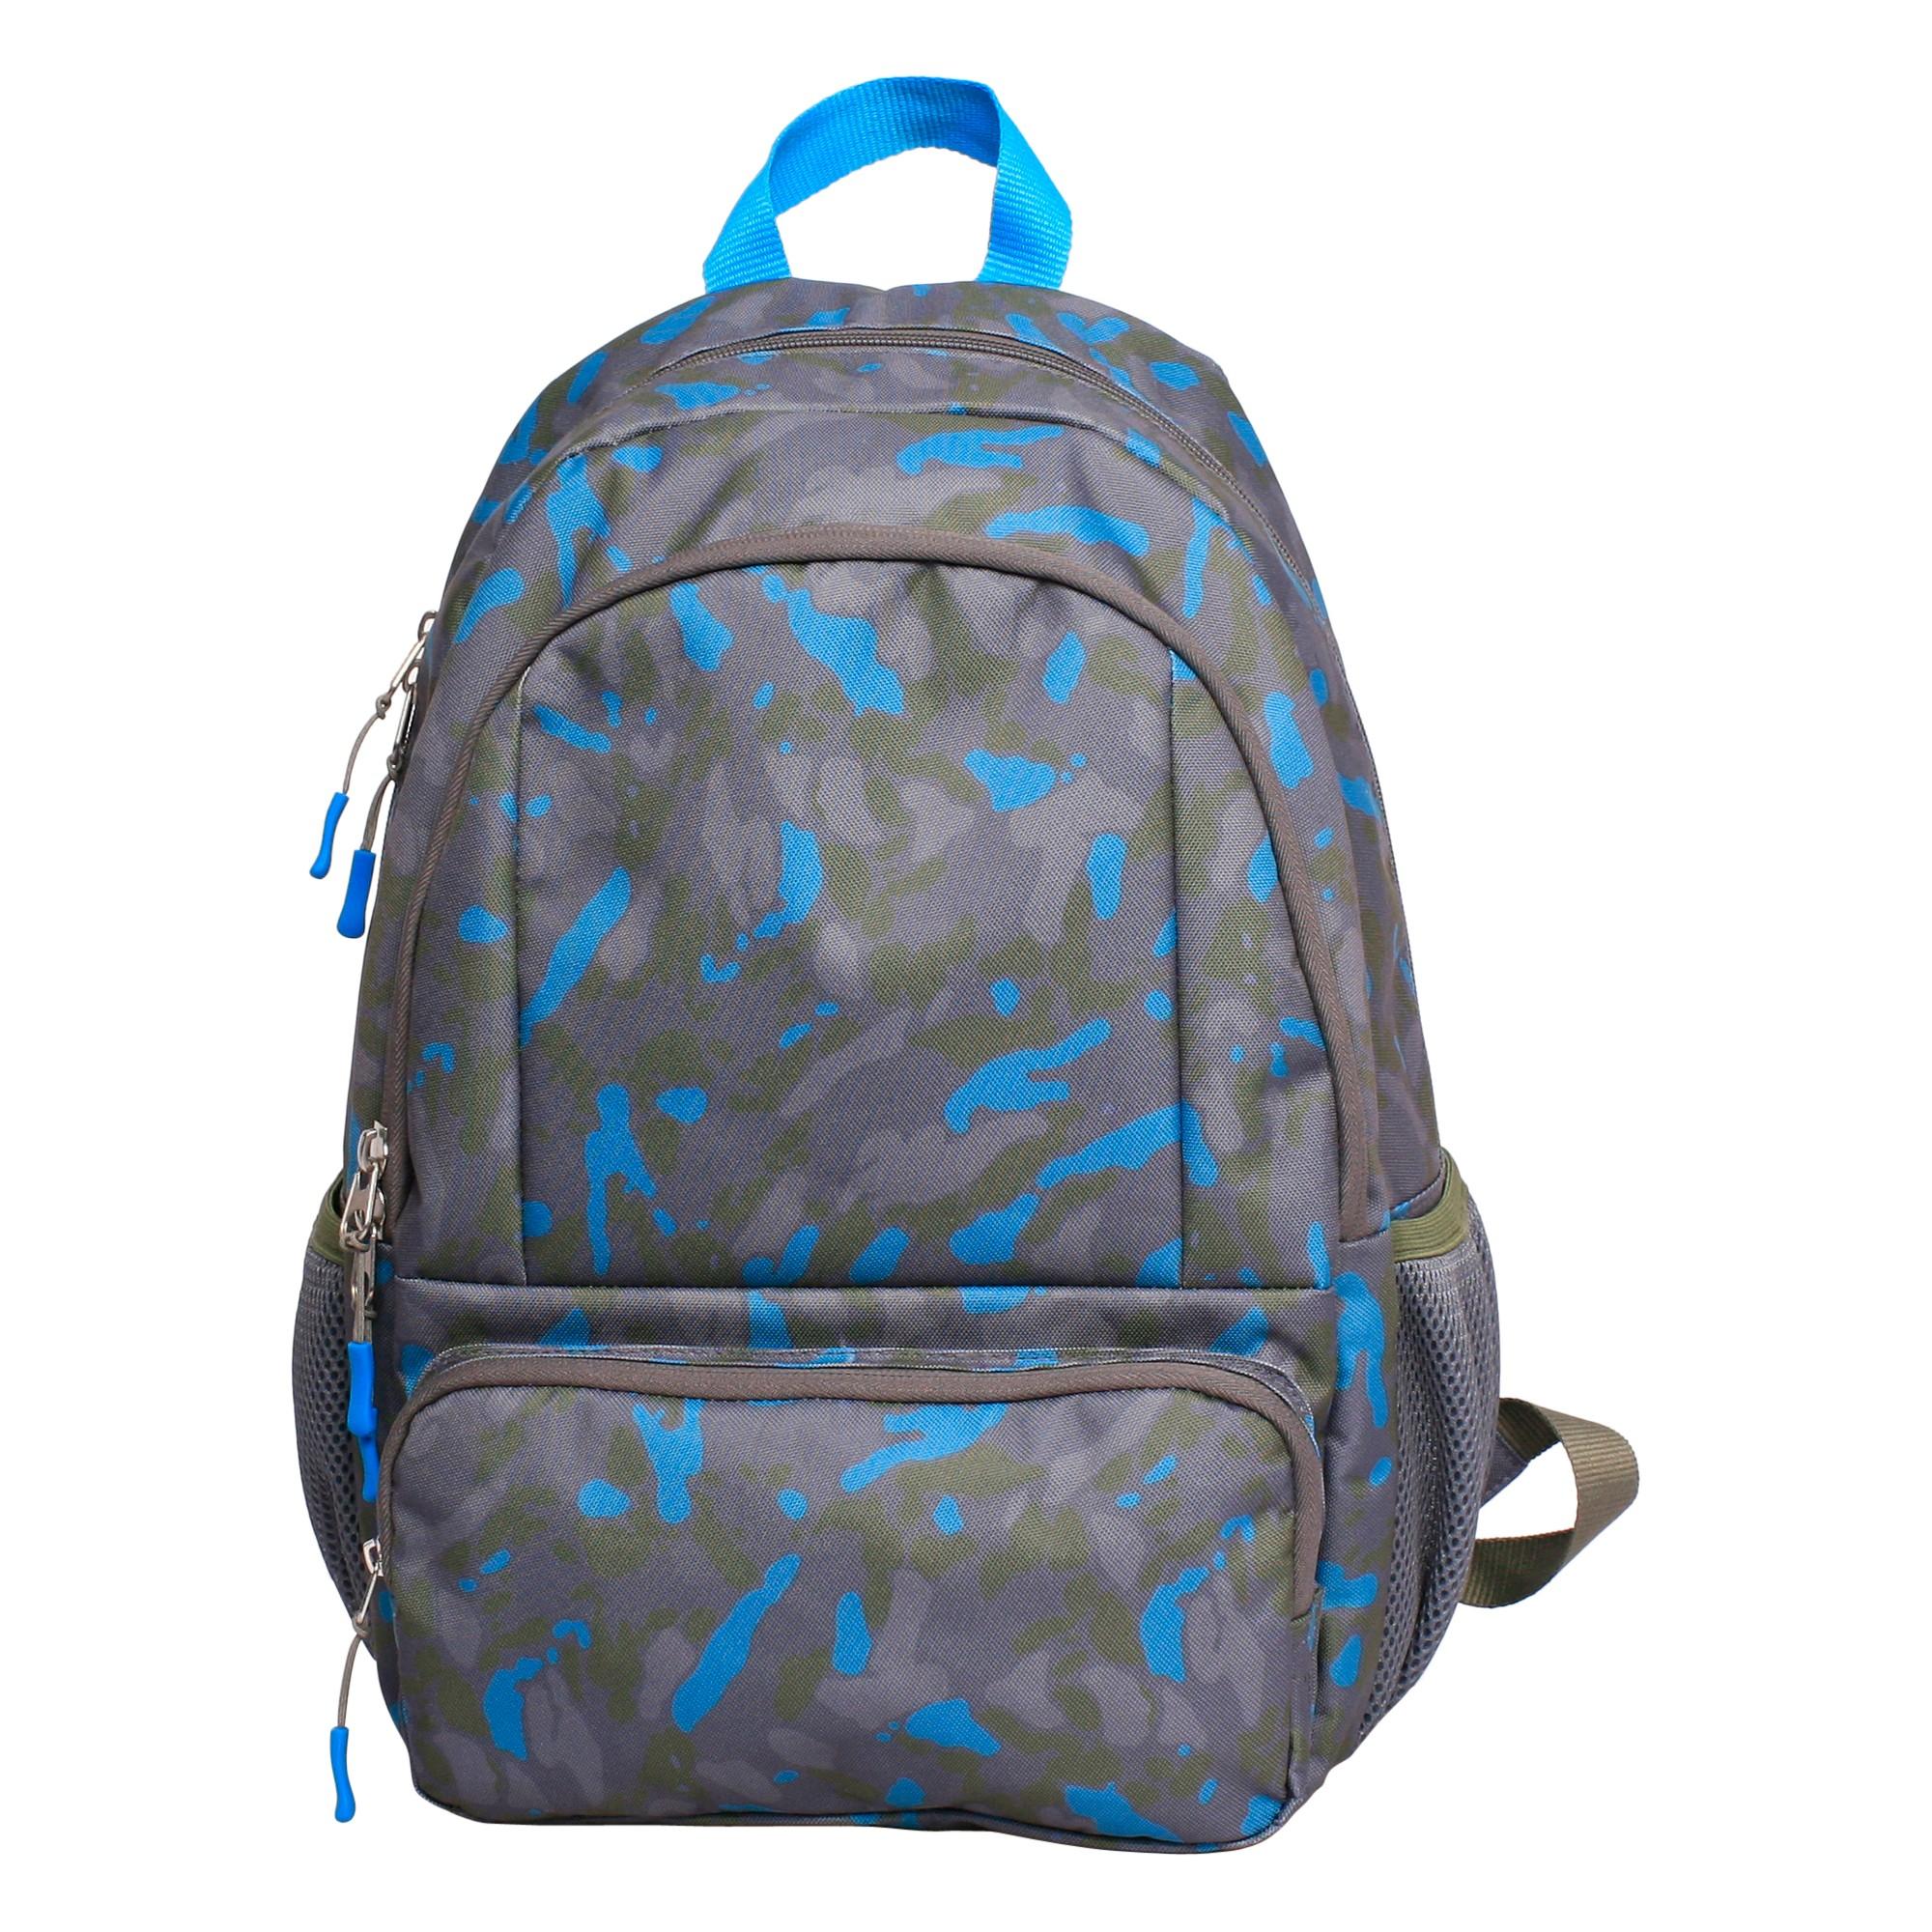 Kids  Backpack - Cat   Jack Camo 17 64426ed492bb6